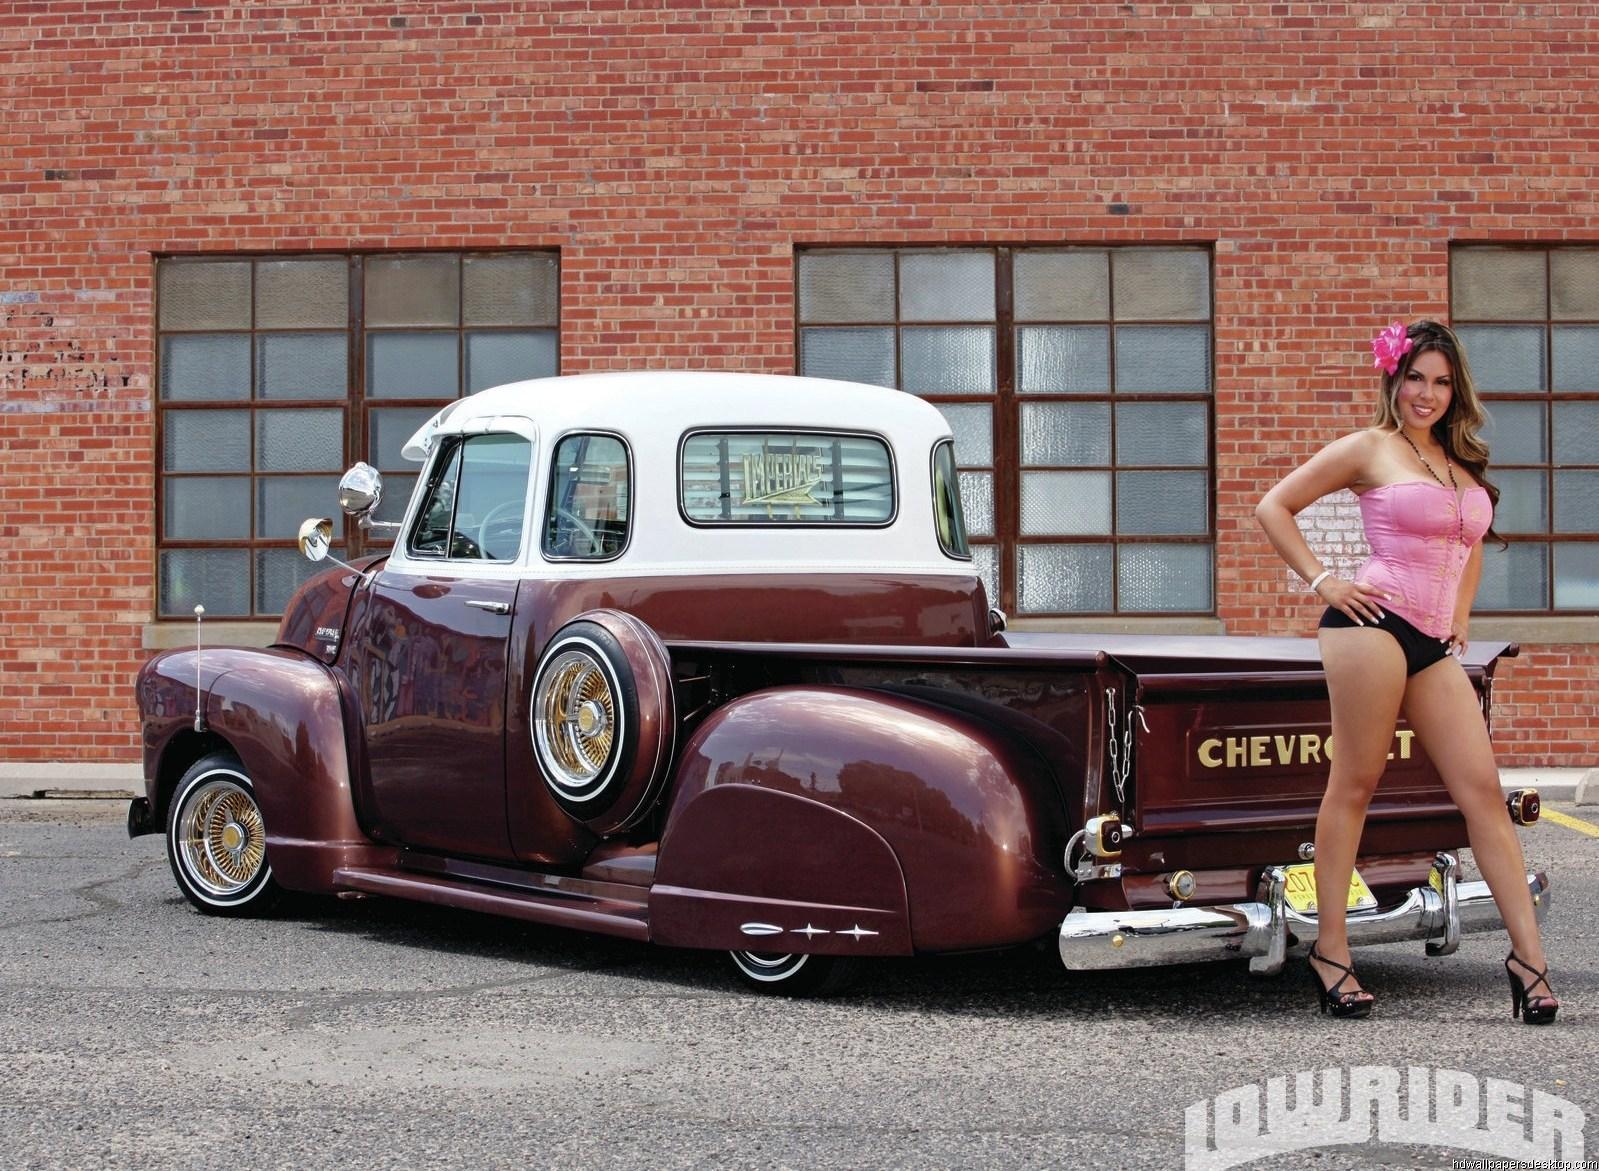 Custom Gmc Trucks >> Girls and Trucks Wallpapers - WallpaperSafari